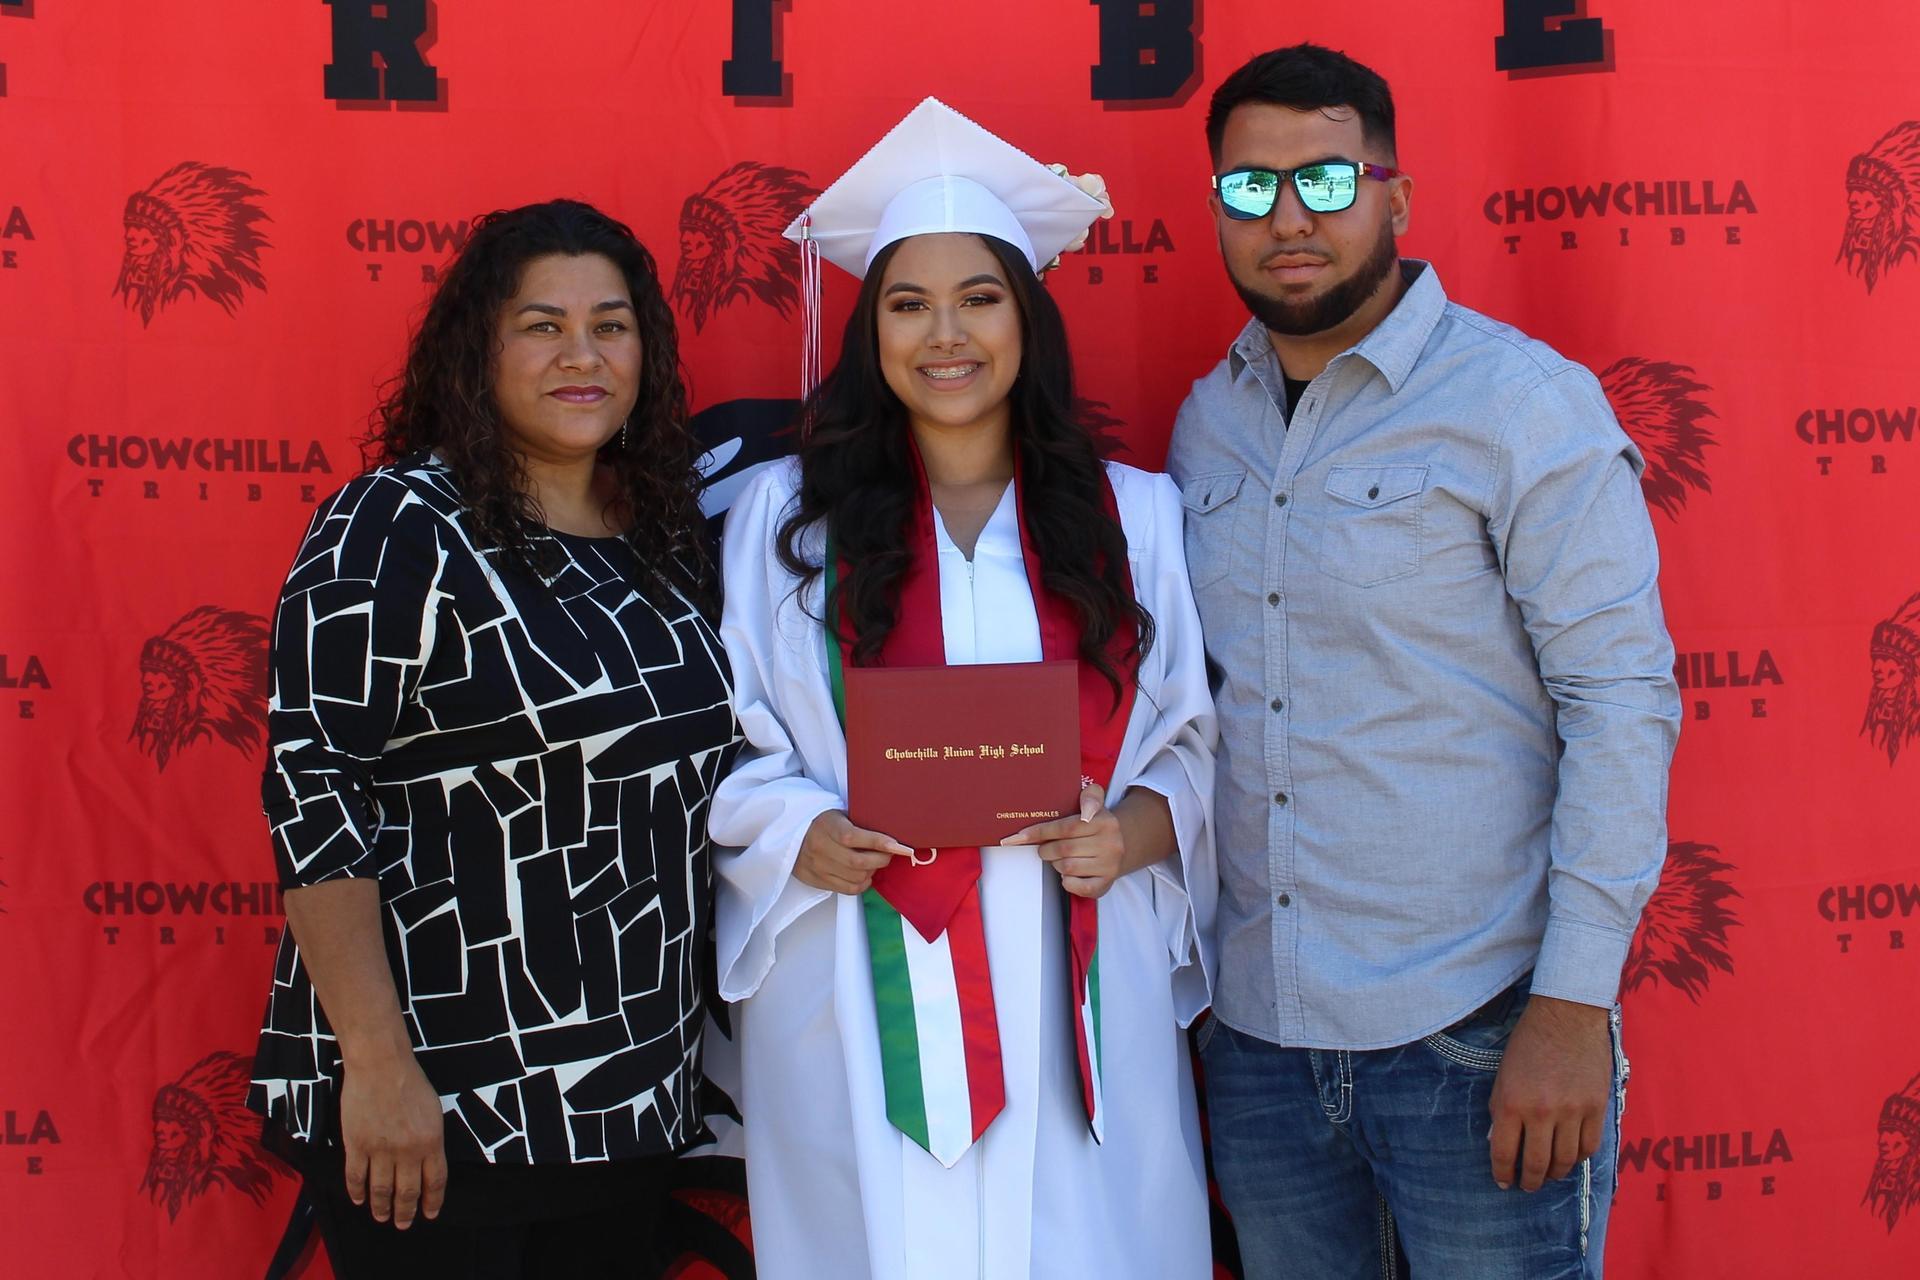 Christina Morales and family